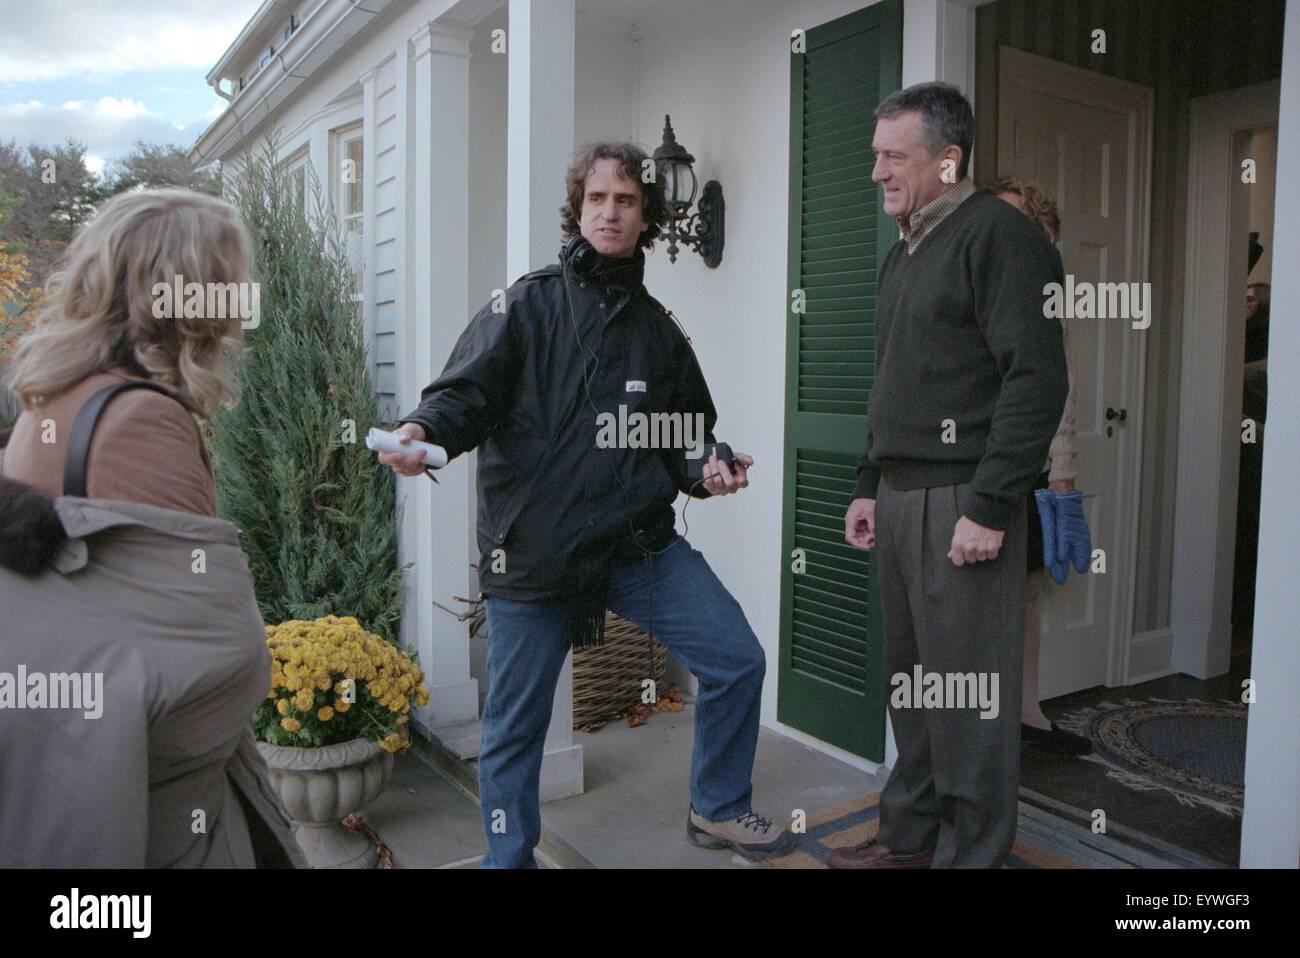 Meet the Parents ; Year : 2000 USA ; Director : Jay Roach ; Teri Polo, Jay Roach, Robert De Niro ; Shooting picture - Stock Image